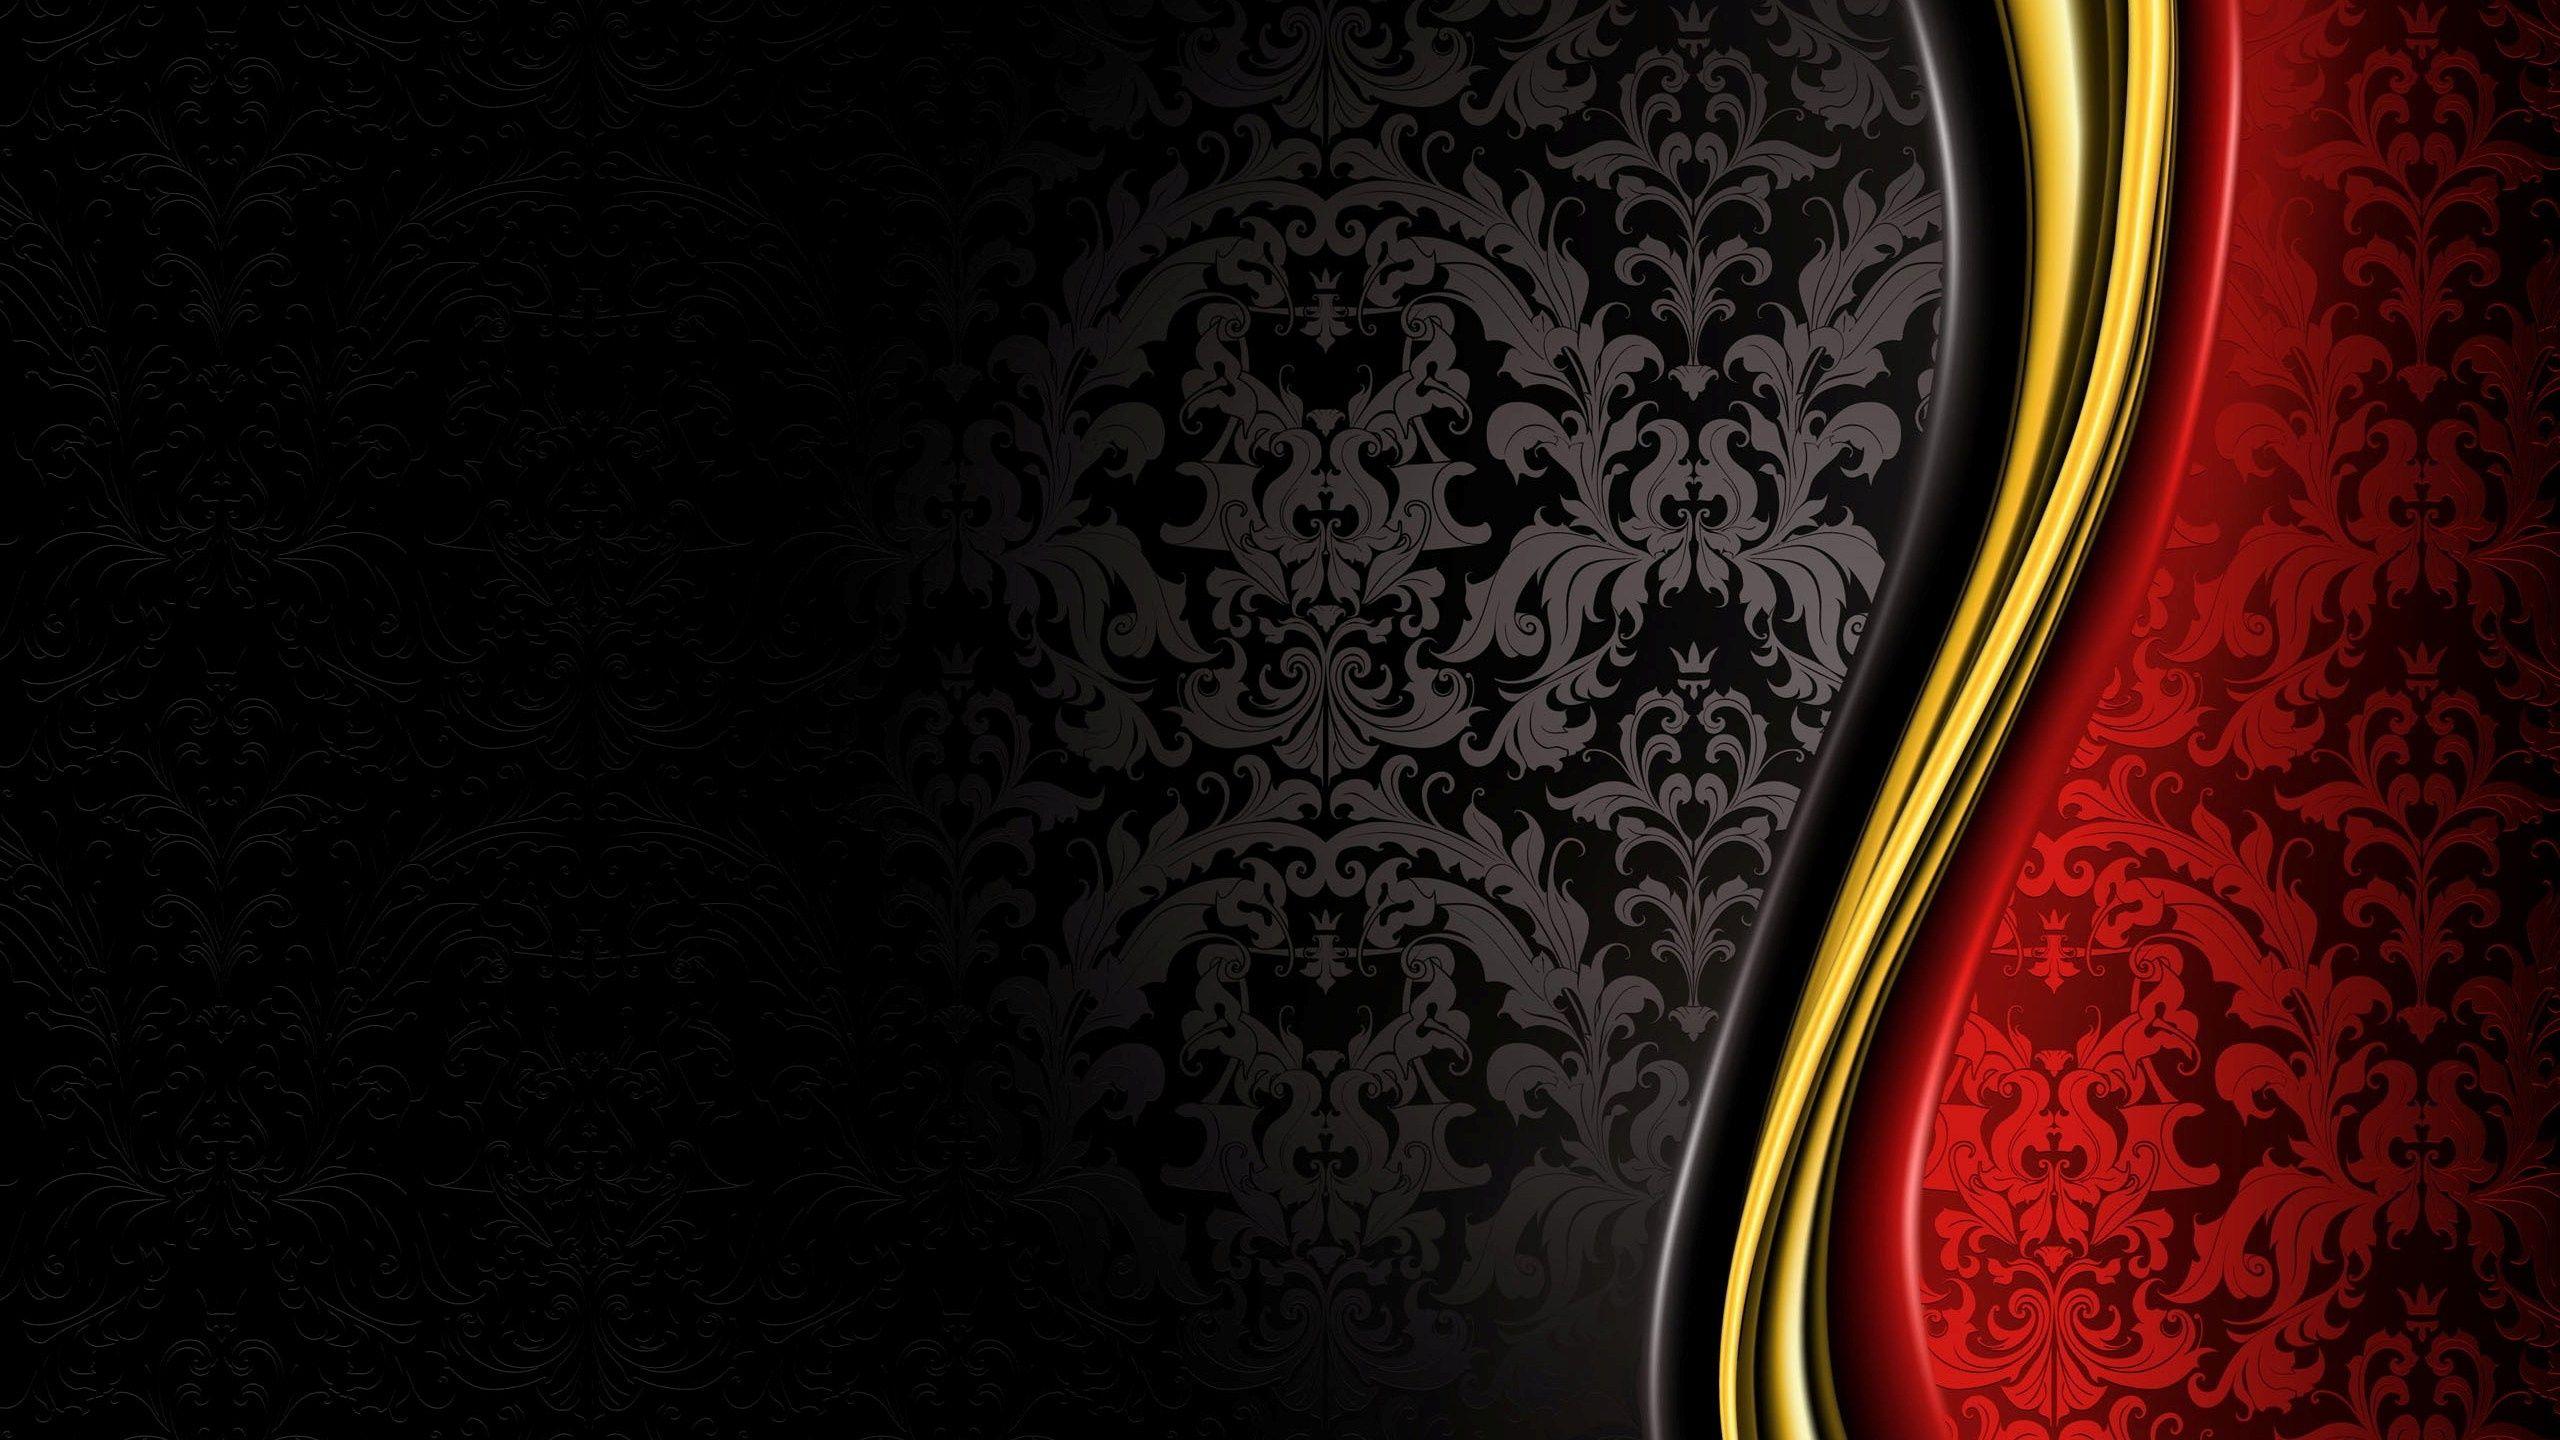 Elegant Desktop HD Wallpaper | Hhgj in 2019 | Black background wallpaper, Black wallpaper, Wallpaper